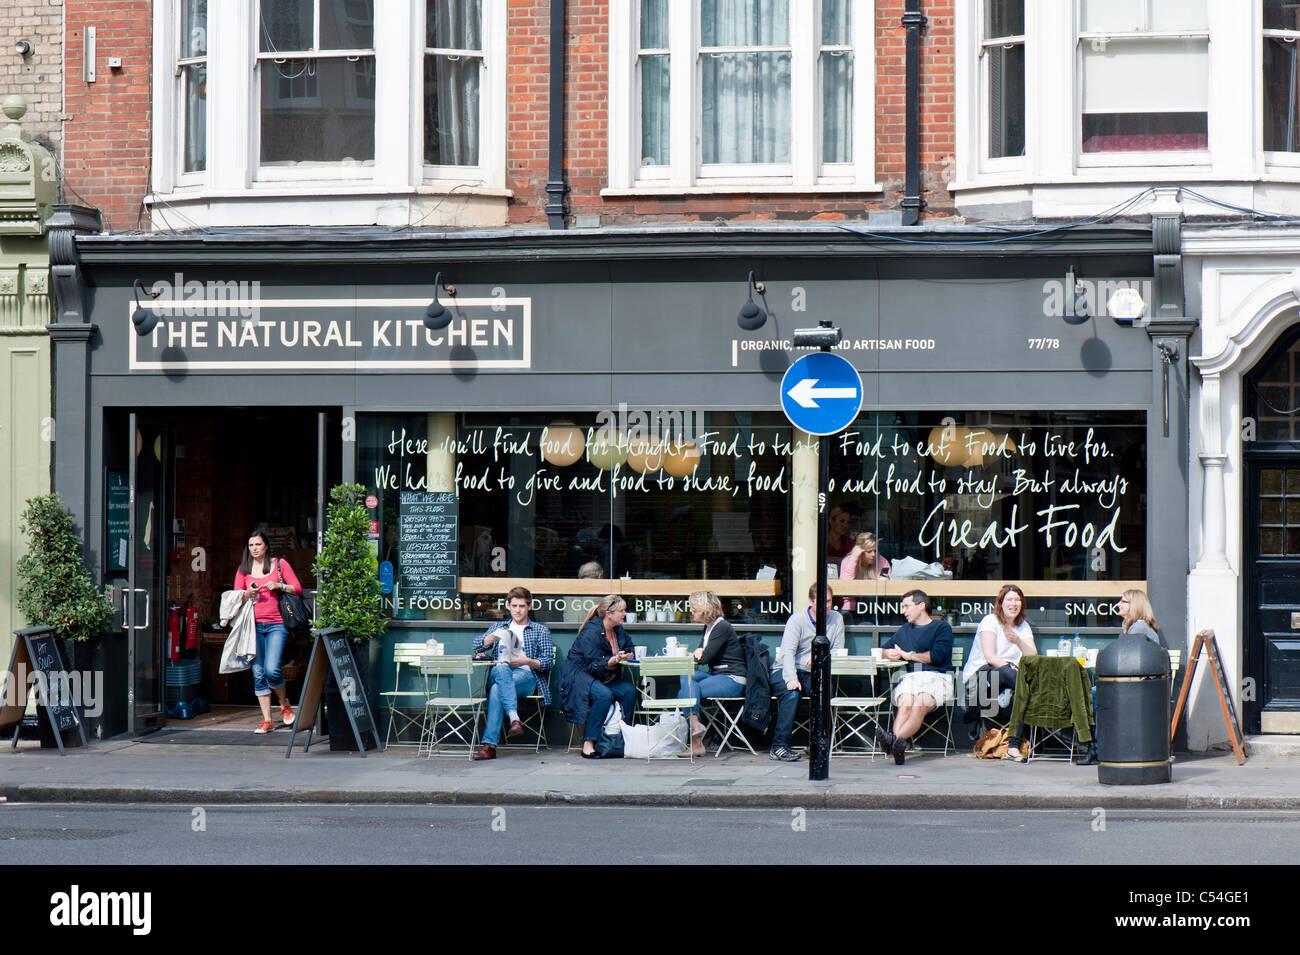 High Street Coffee Shop Stock Photos & High Street Coffee Shop Stock Images - Alamy